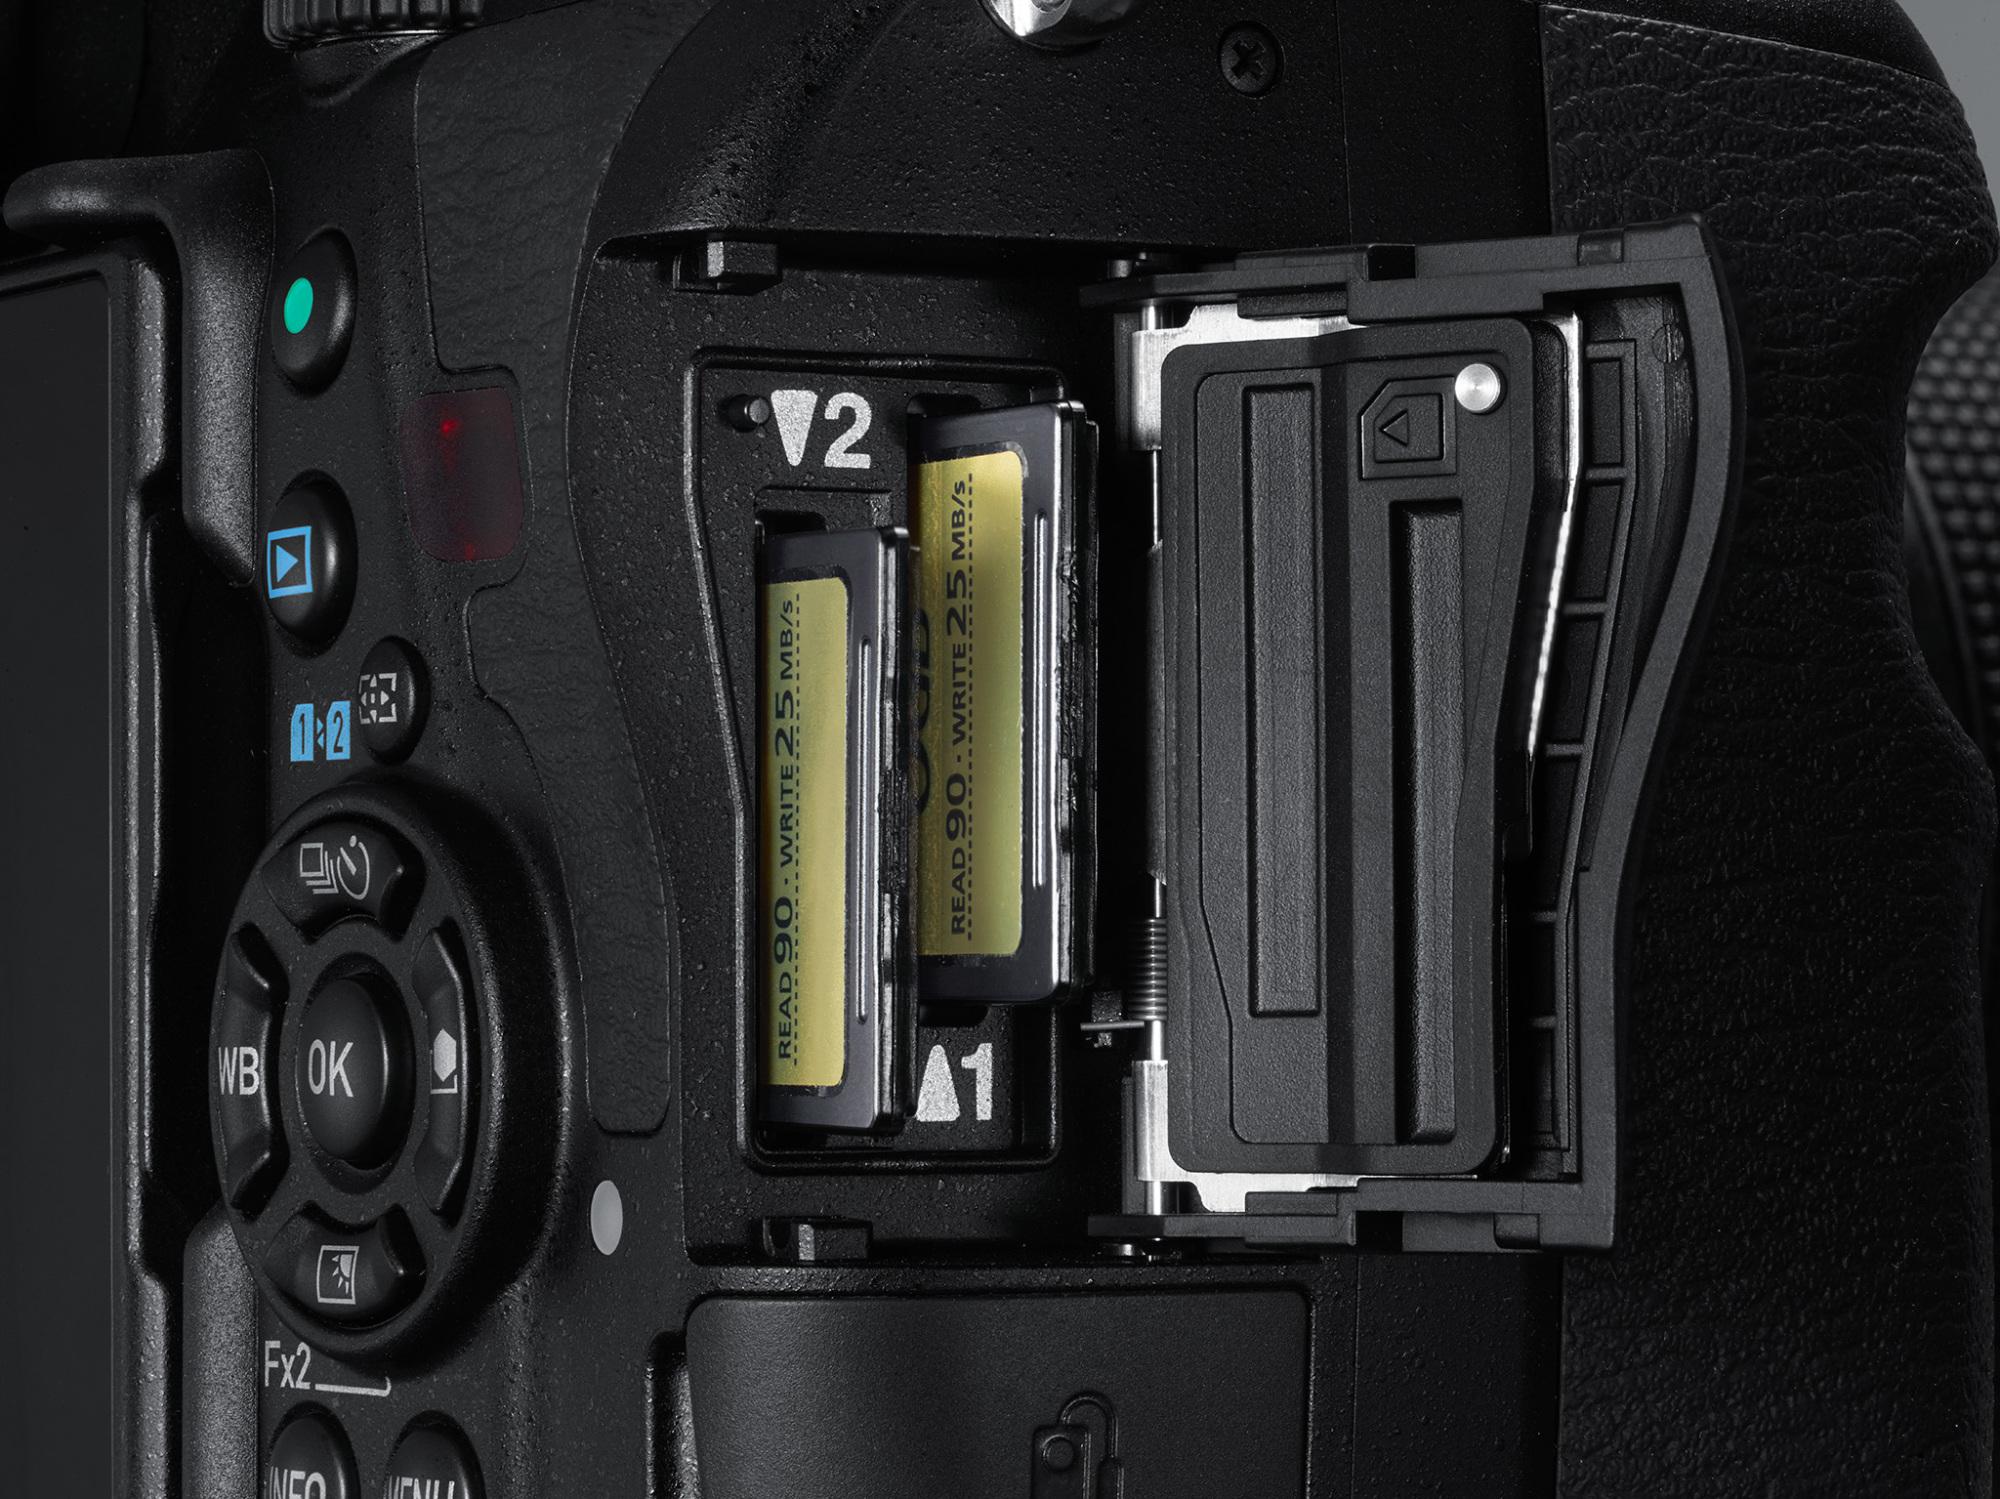 digitale spiegelreflexkamera k 1 pentax stellt erste. Black Bedroom Furniture Sets. Home Design Ideas